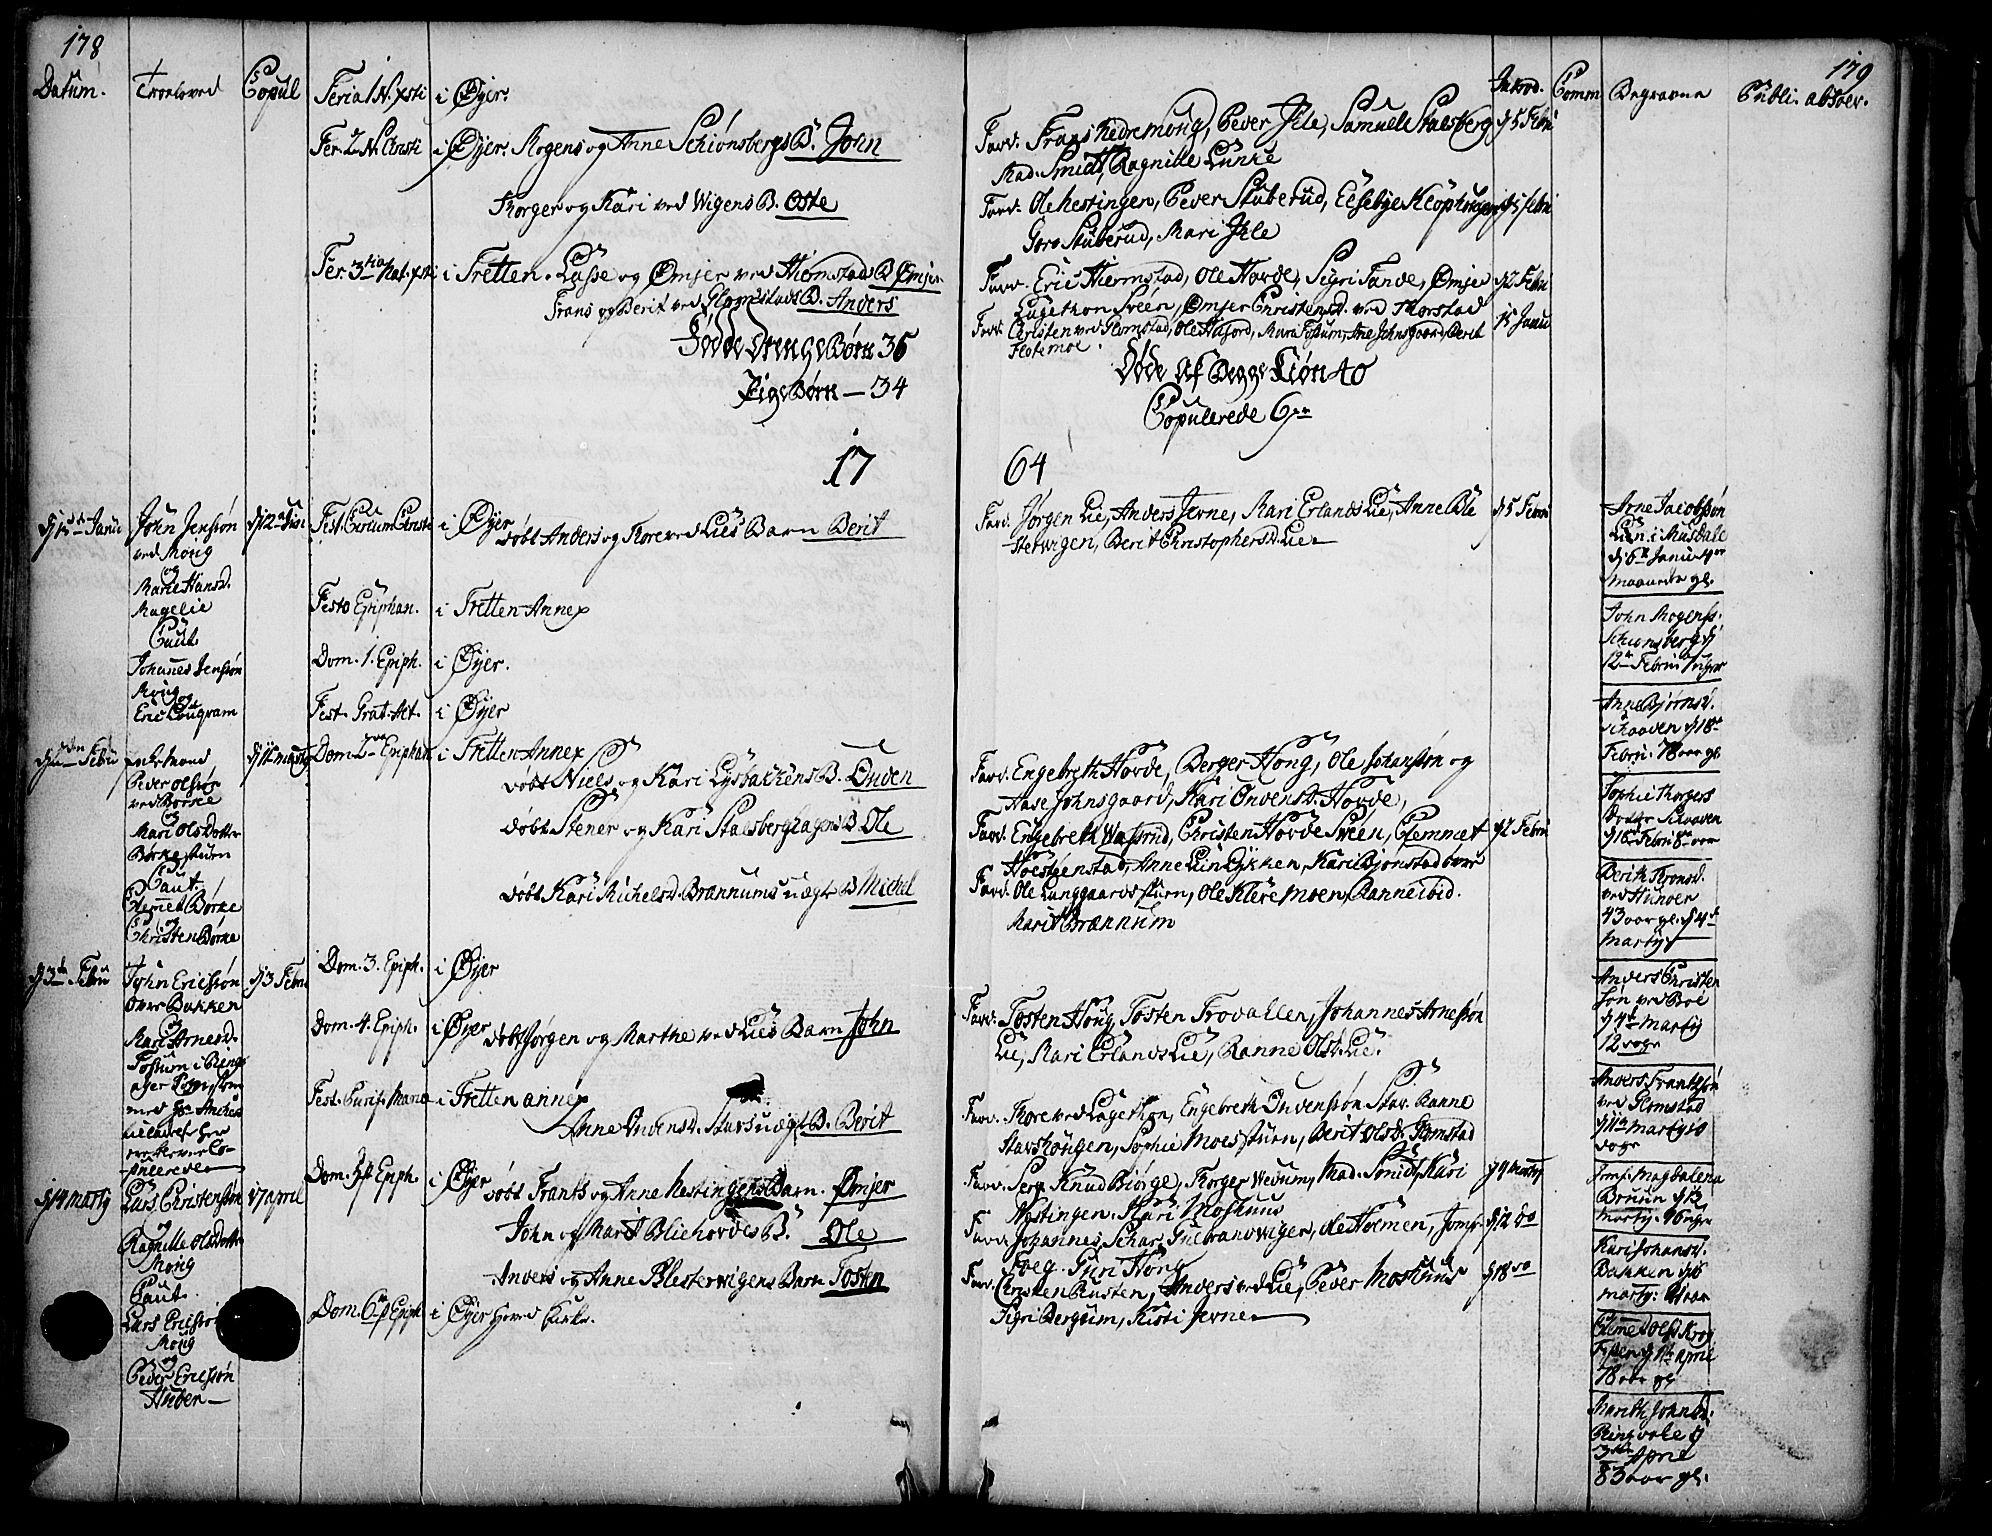 SAH, Øyer prestekontor, Ministerialbok nr. 2, 1733-1784, s. 178-179